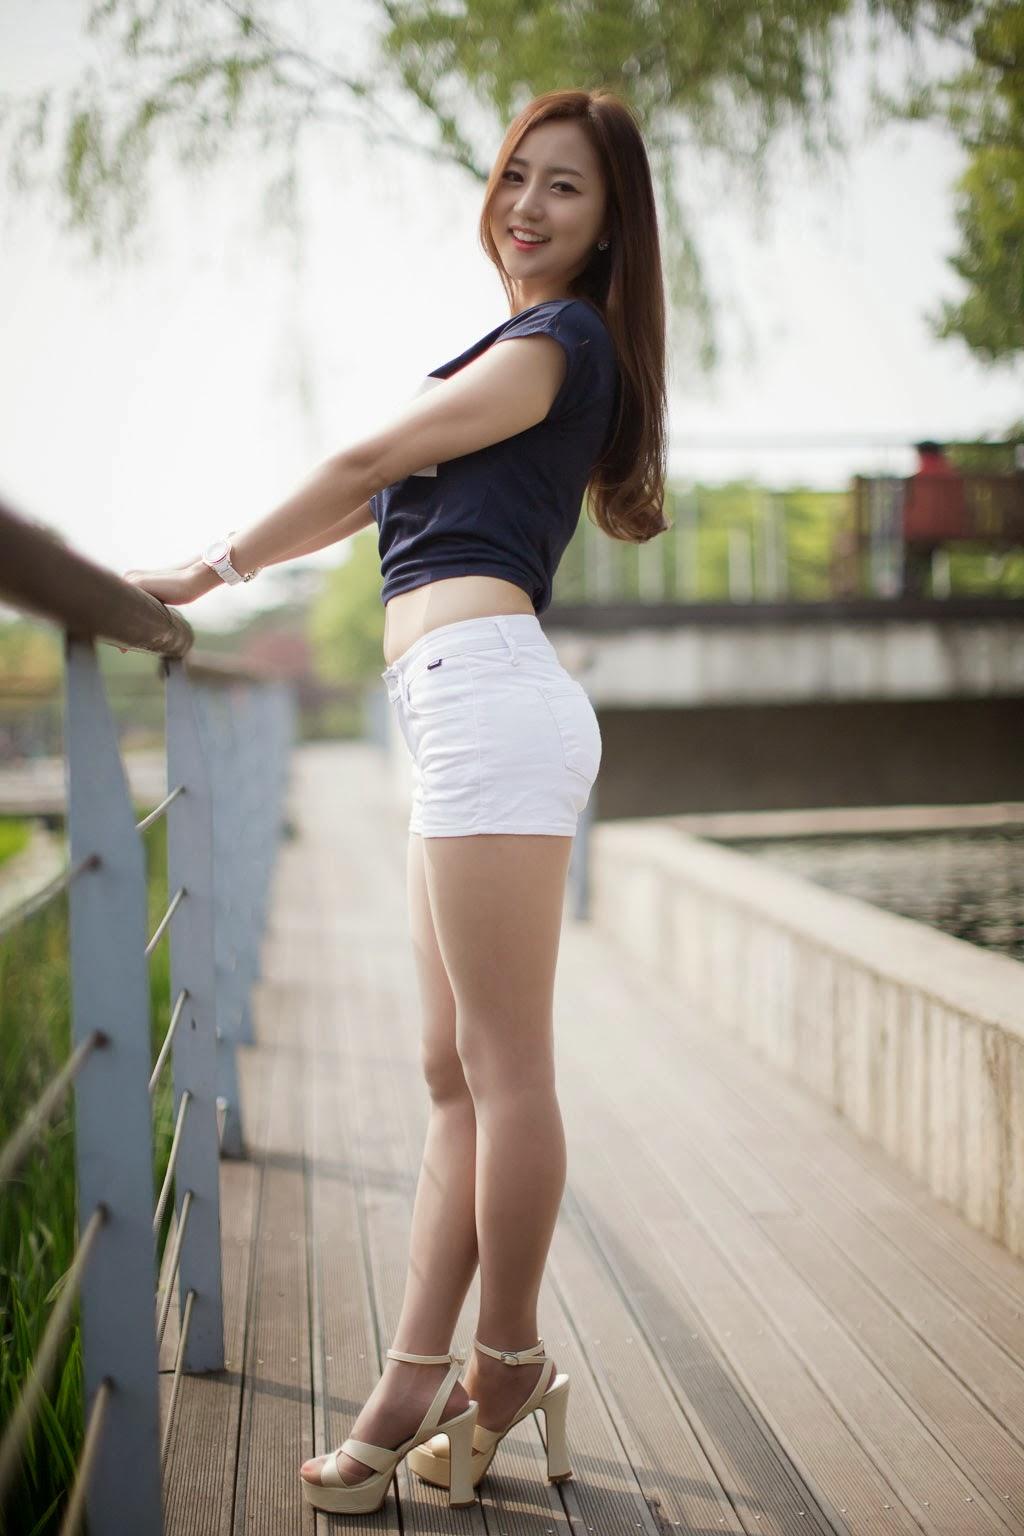 Woman asian POV chicktrainer